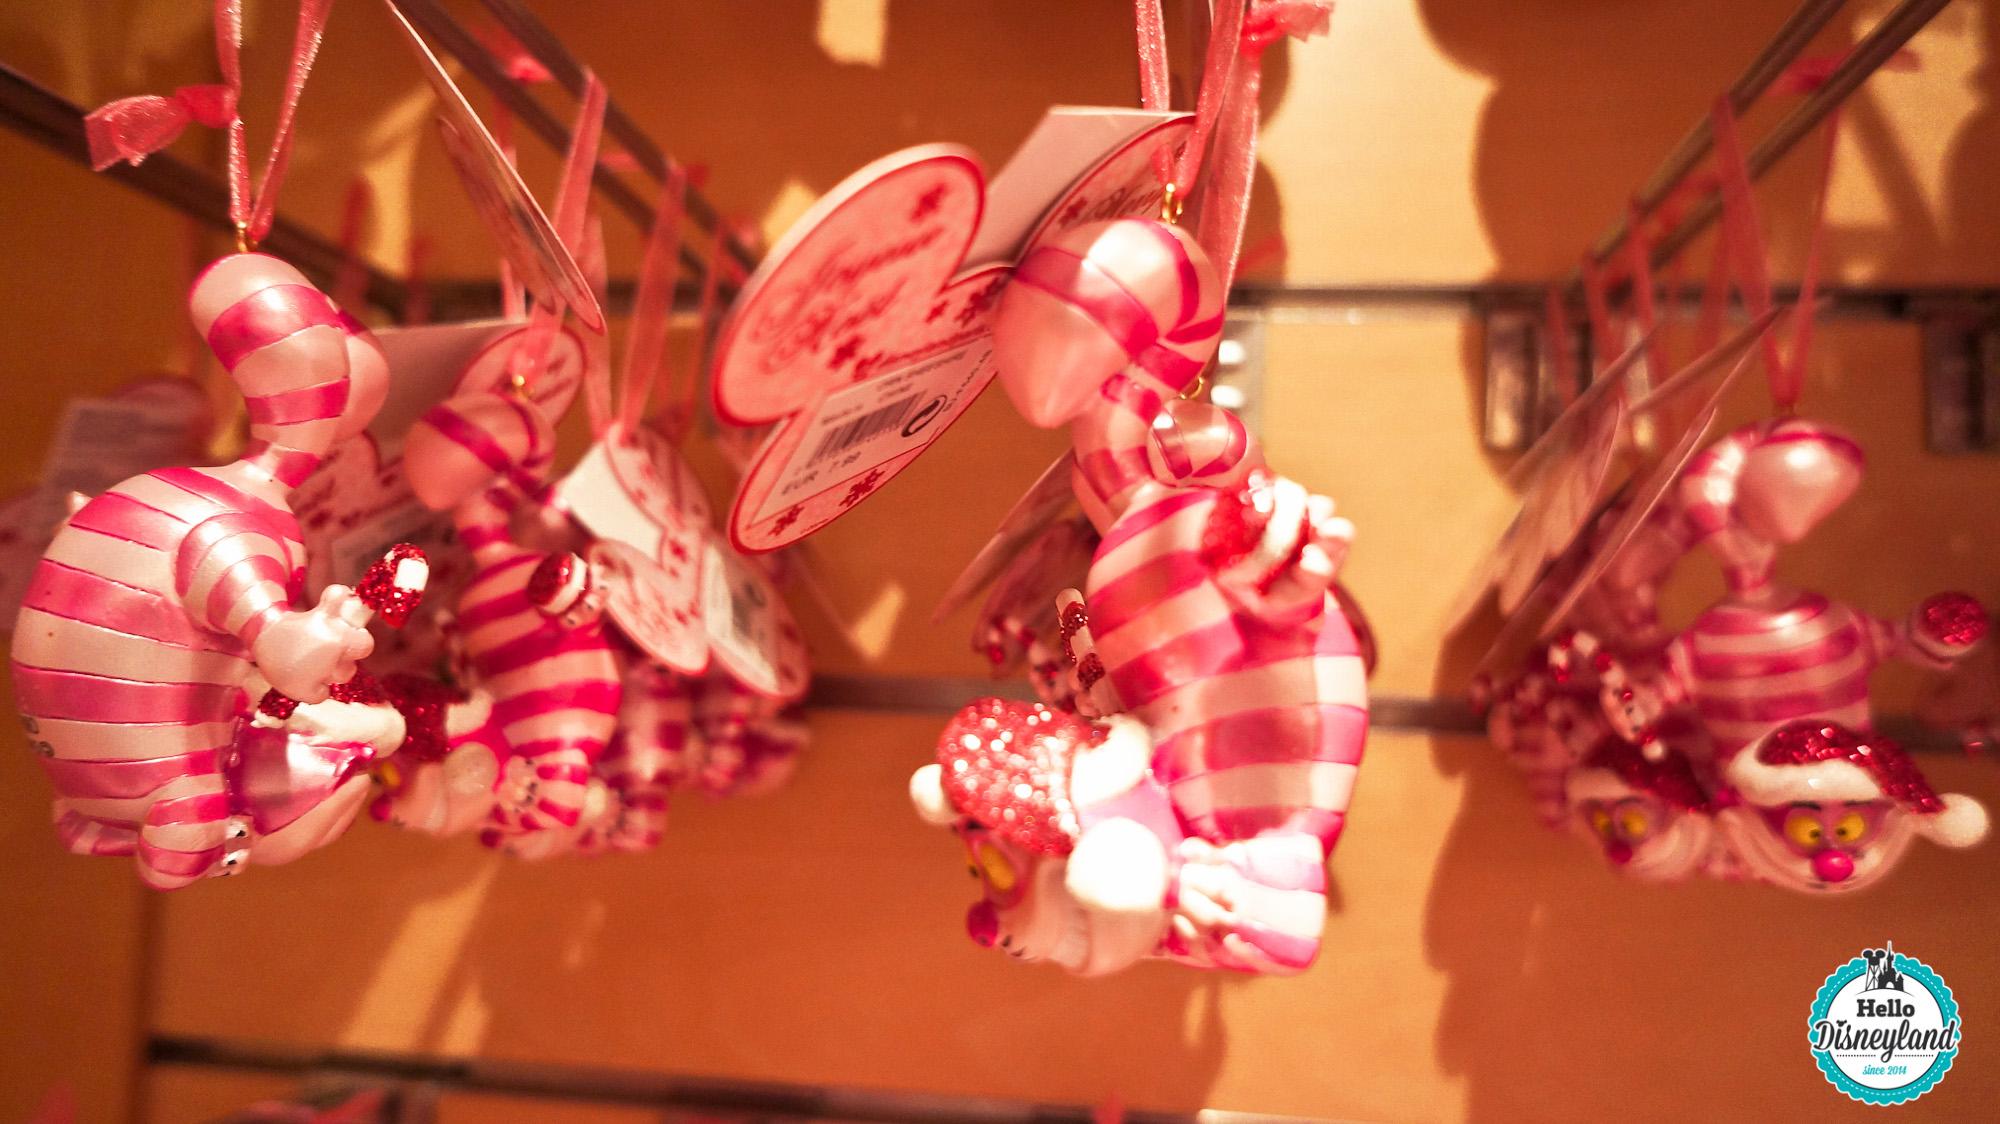 #C20923 Decoration De Noel Disney Pas Cher 5785 les decorations de noel 2000x1124 px @ aertt.com